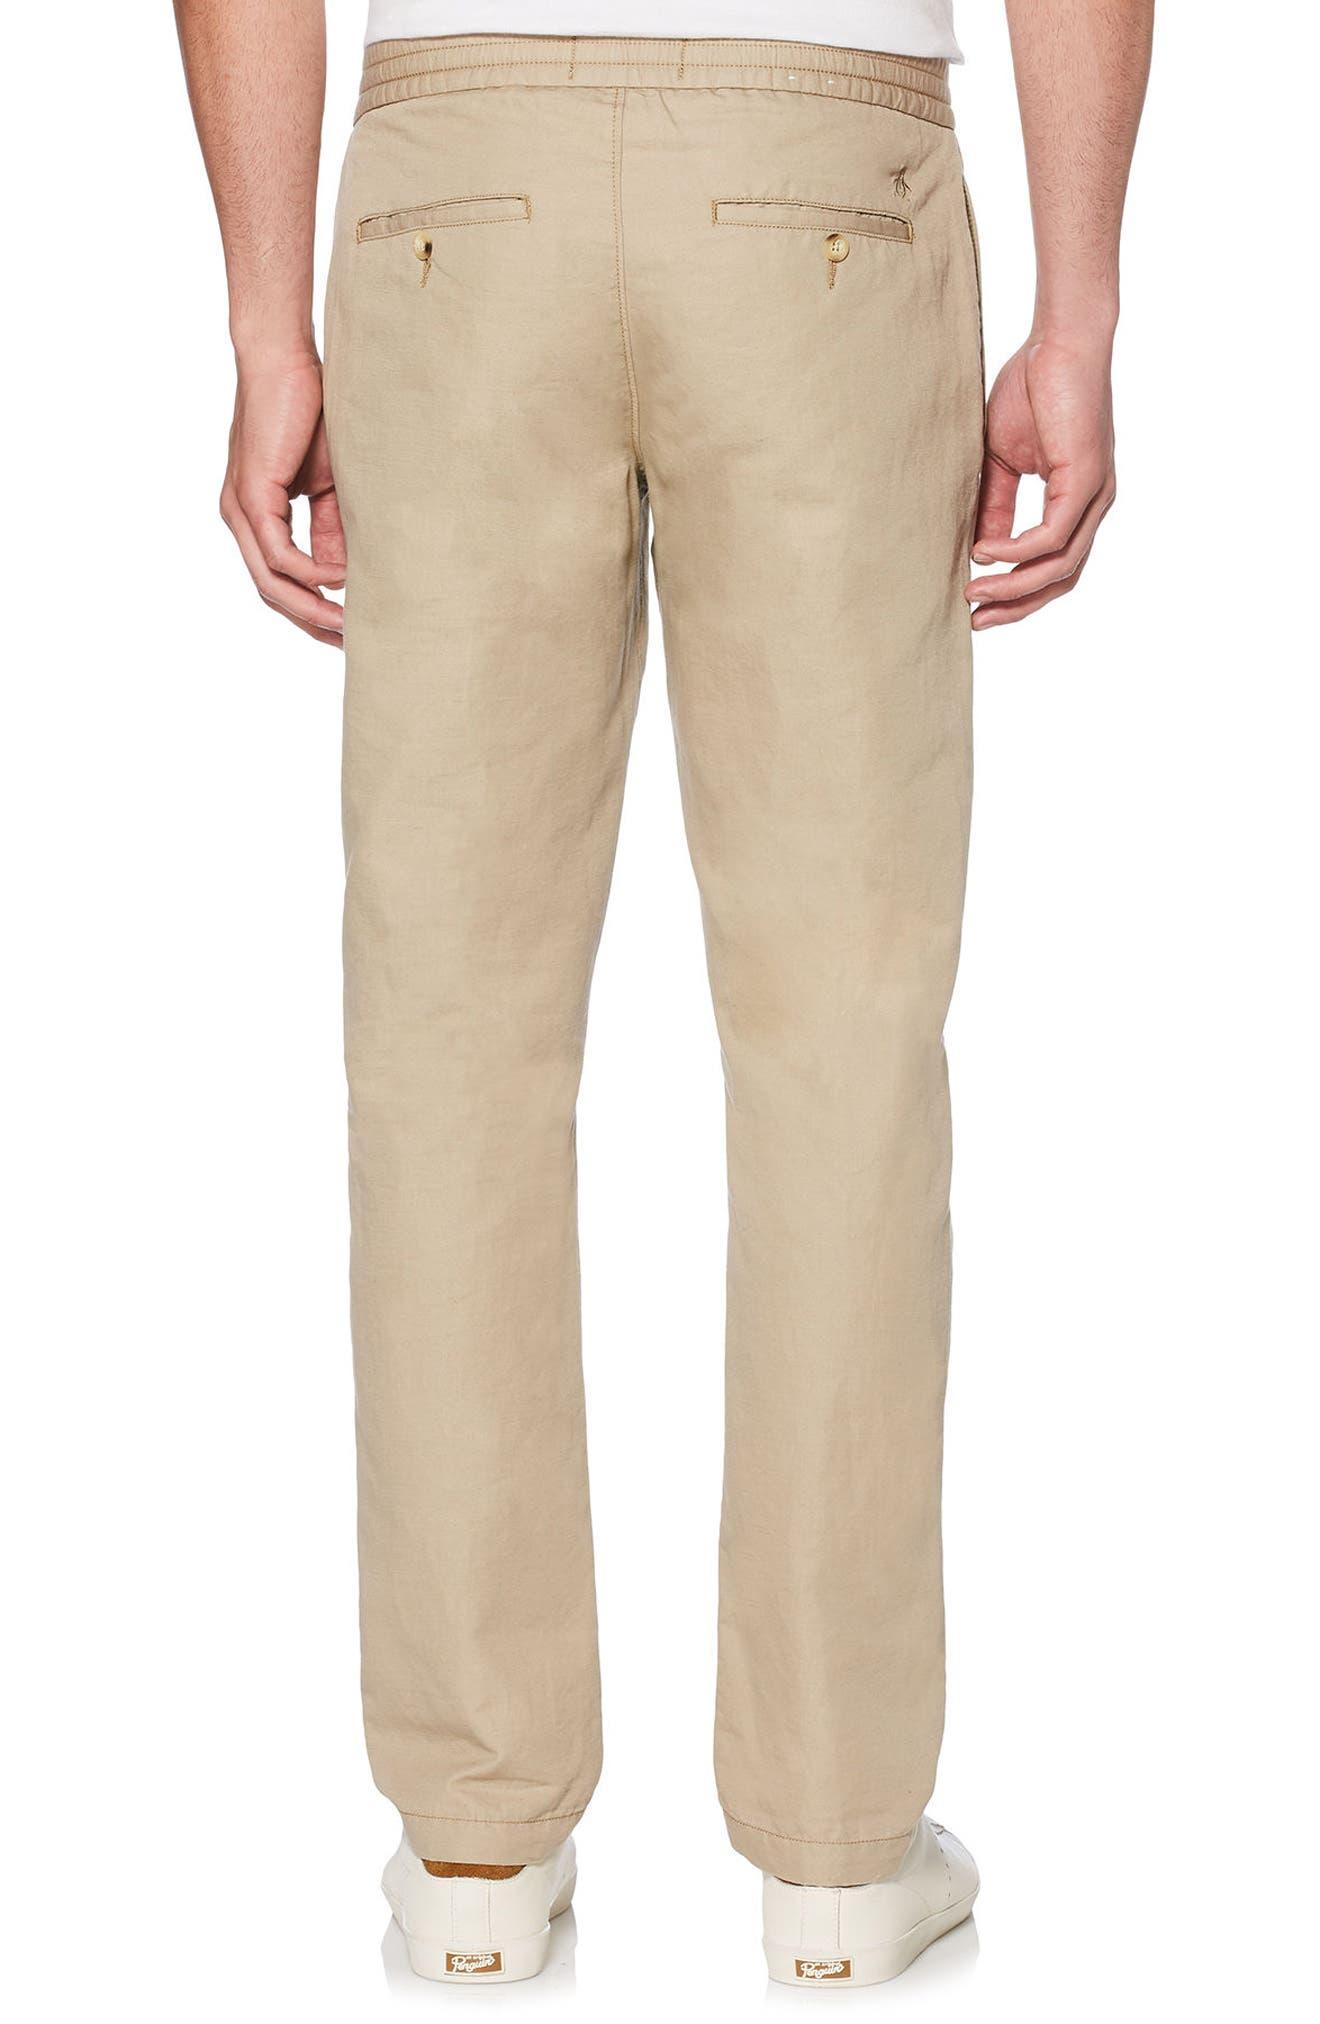 Linen Blend Pants,                             Alternate thumbnail 2, color,                             Crockery